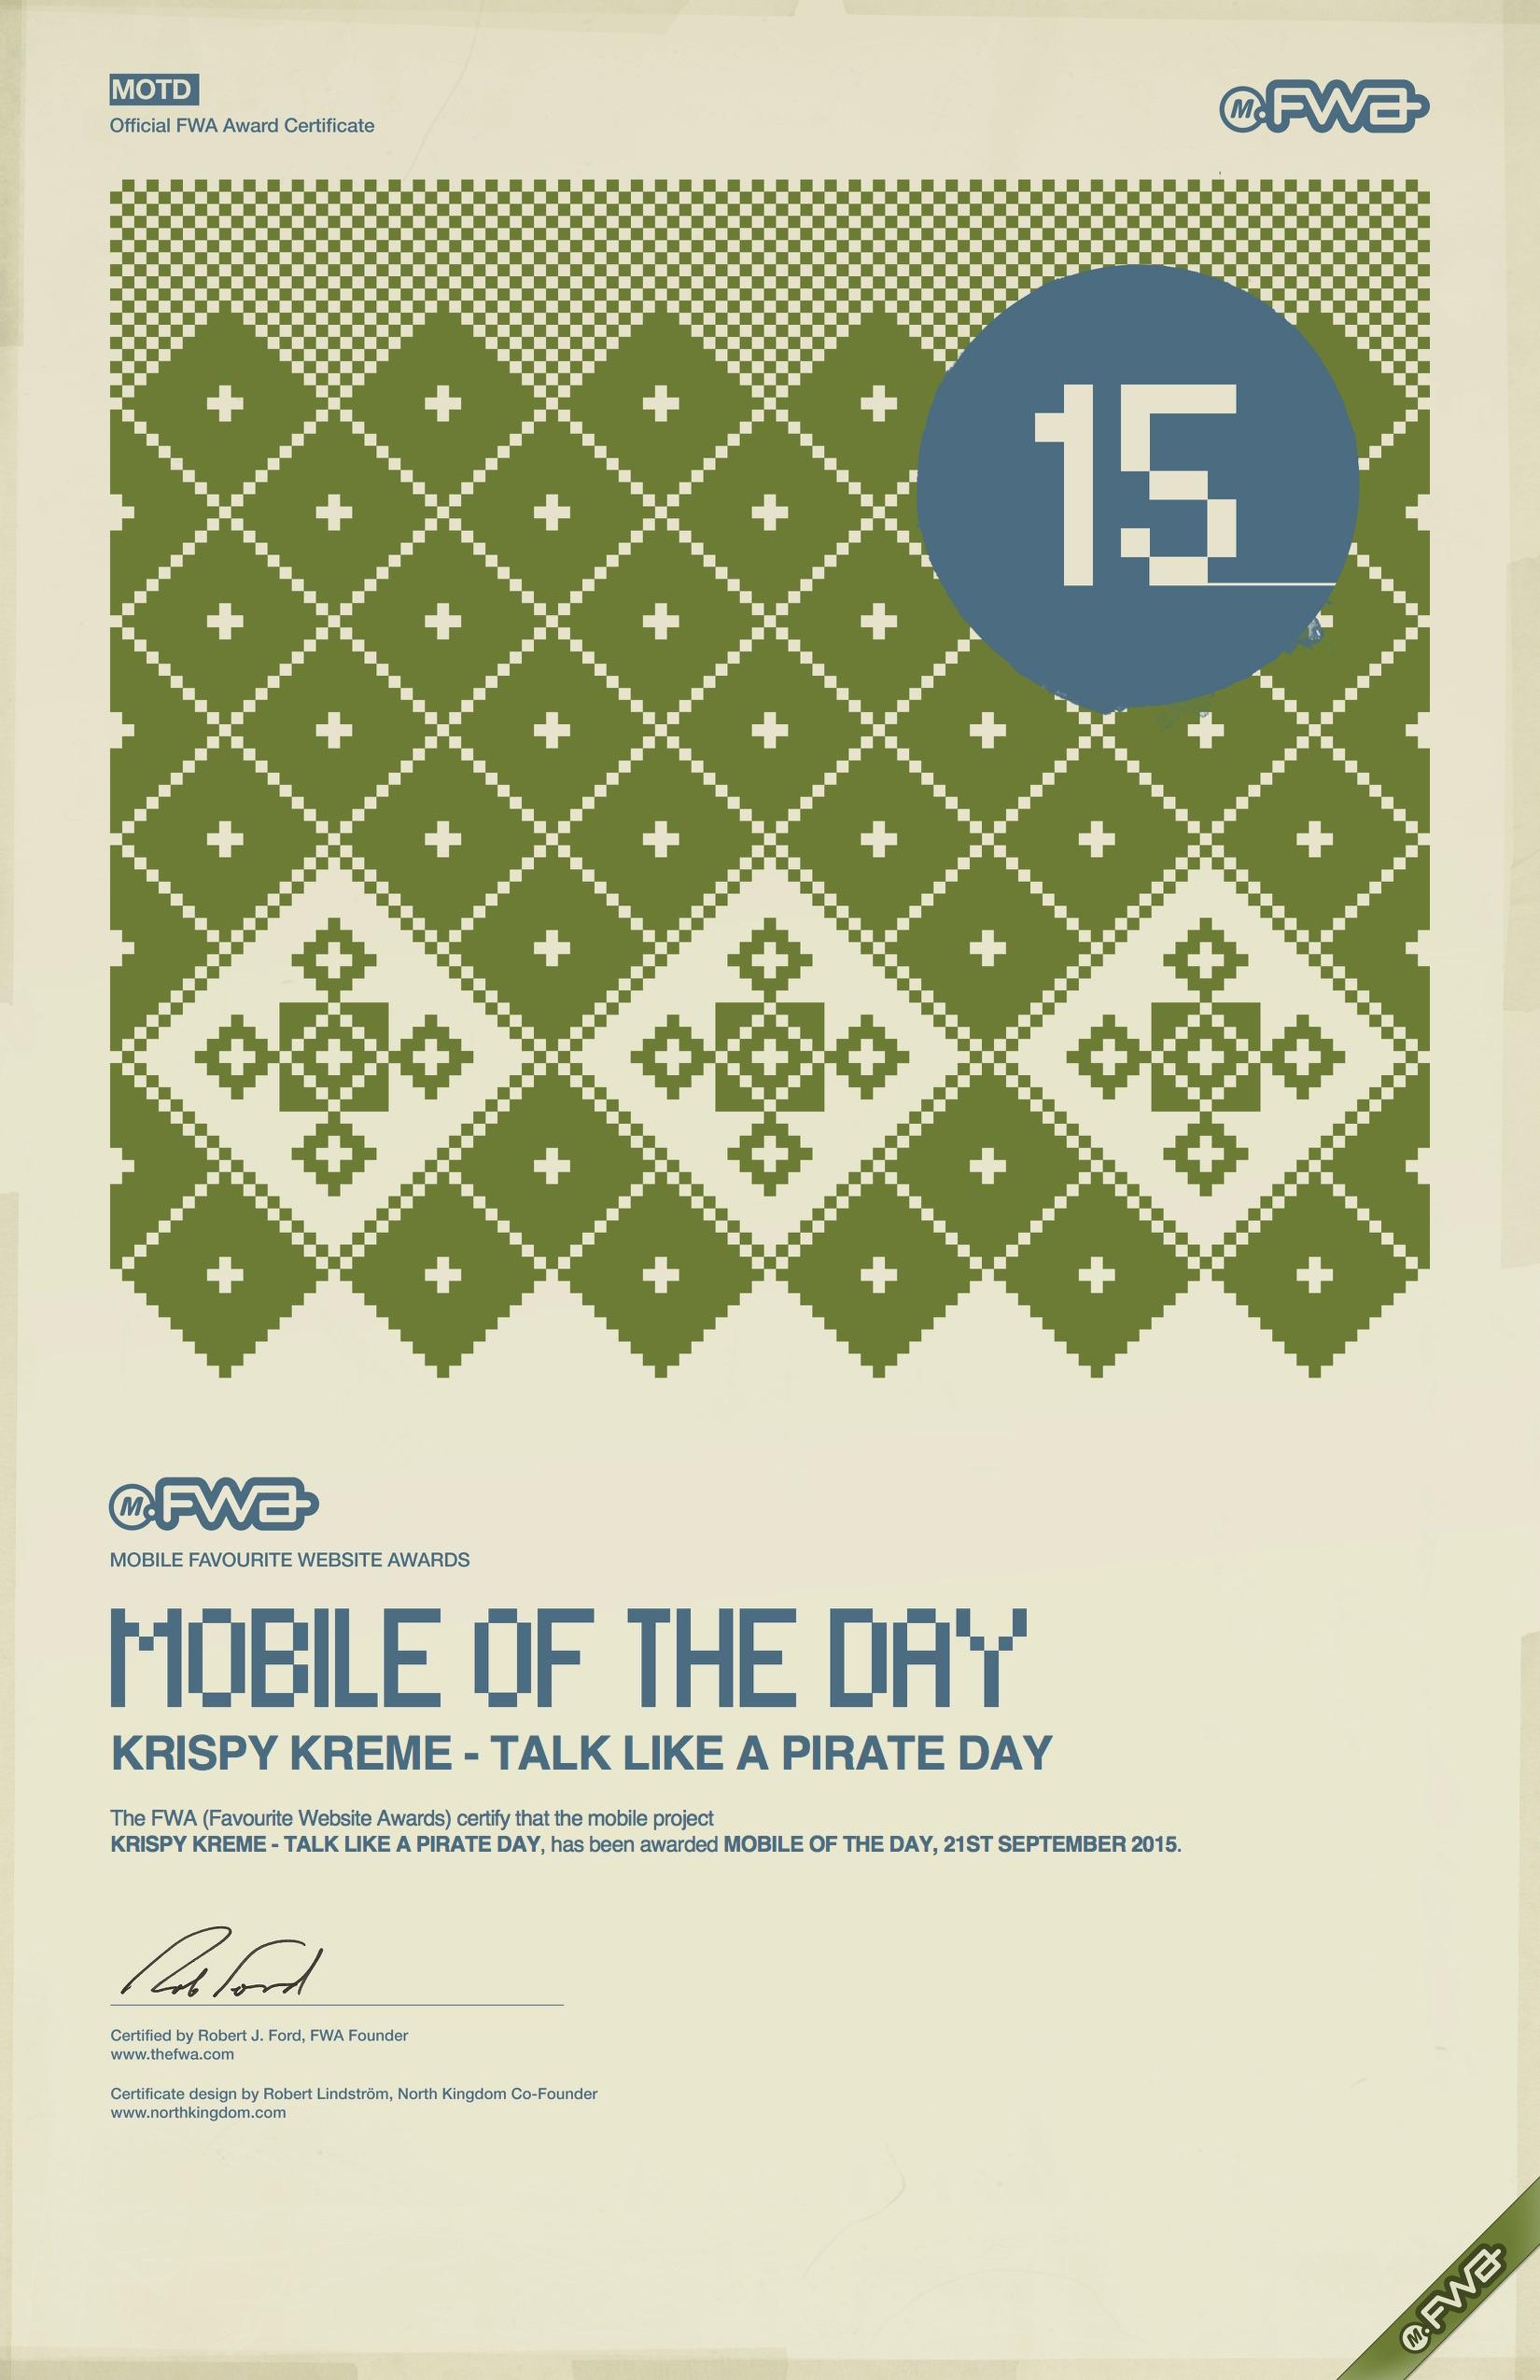 Martin Davidson Creative Director Krispy Kreme Pirate Day FWA Mobile Site of the Day.jpg